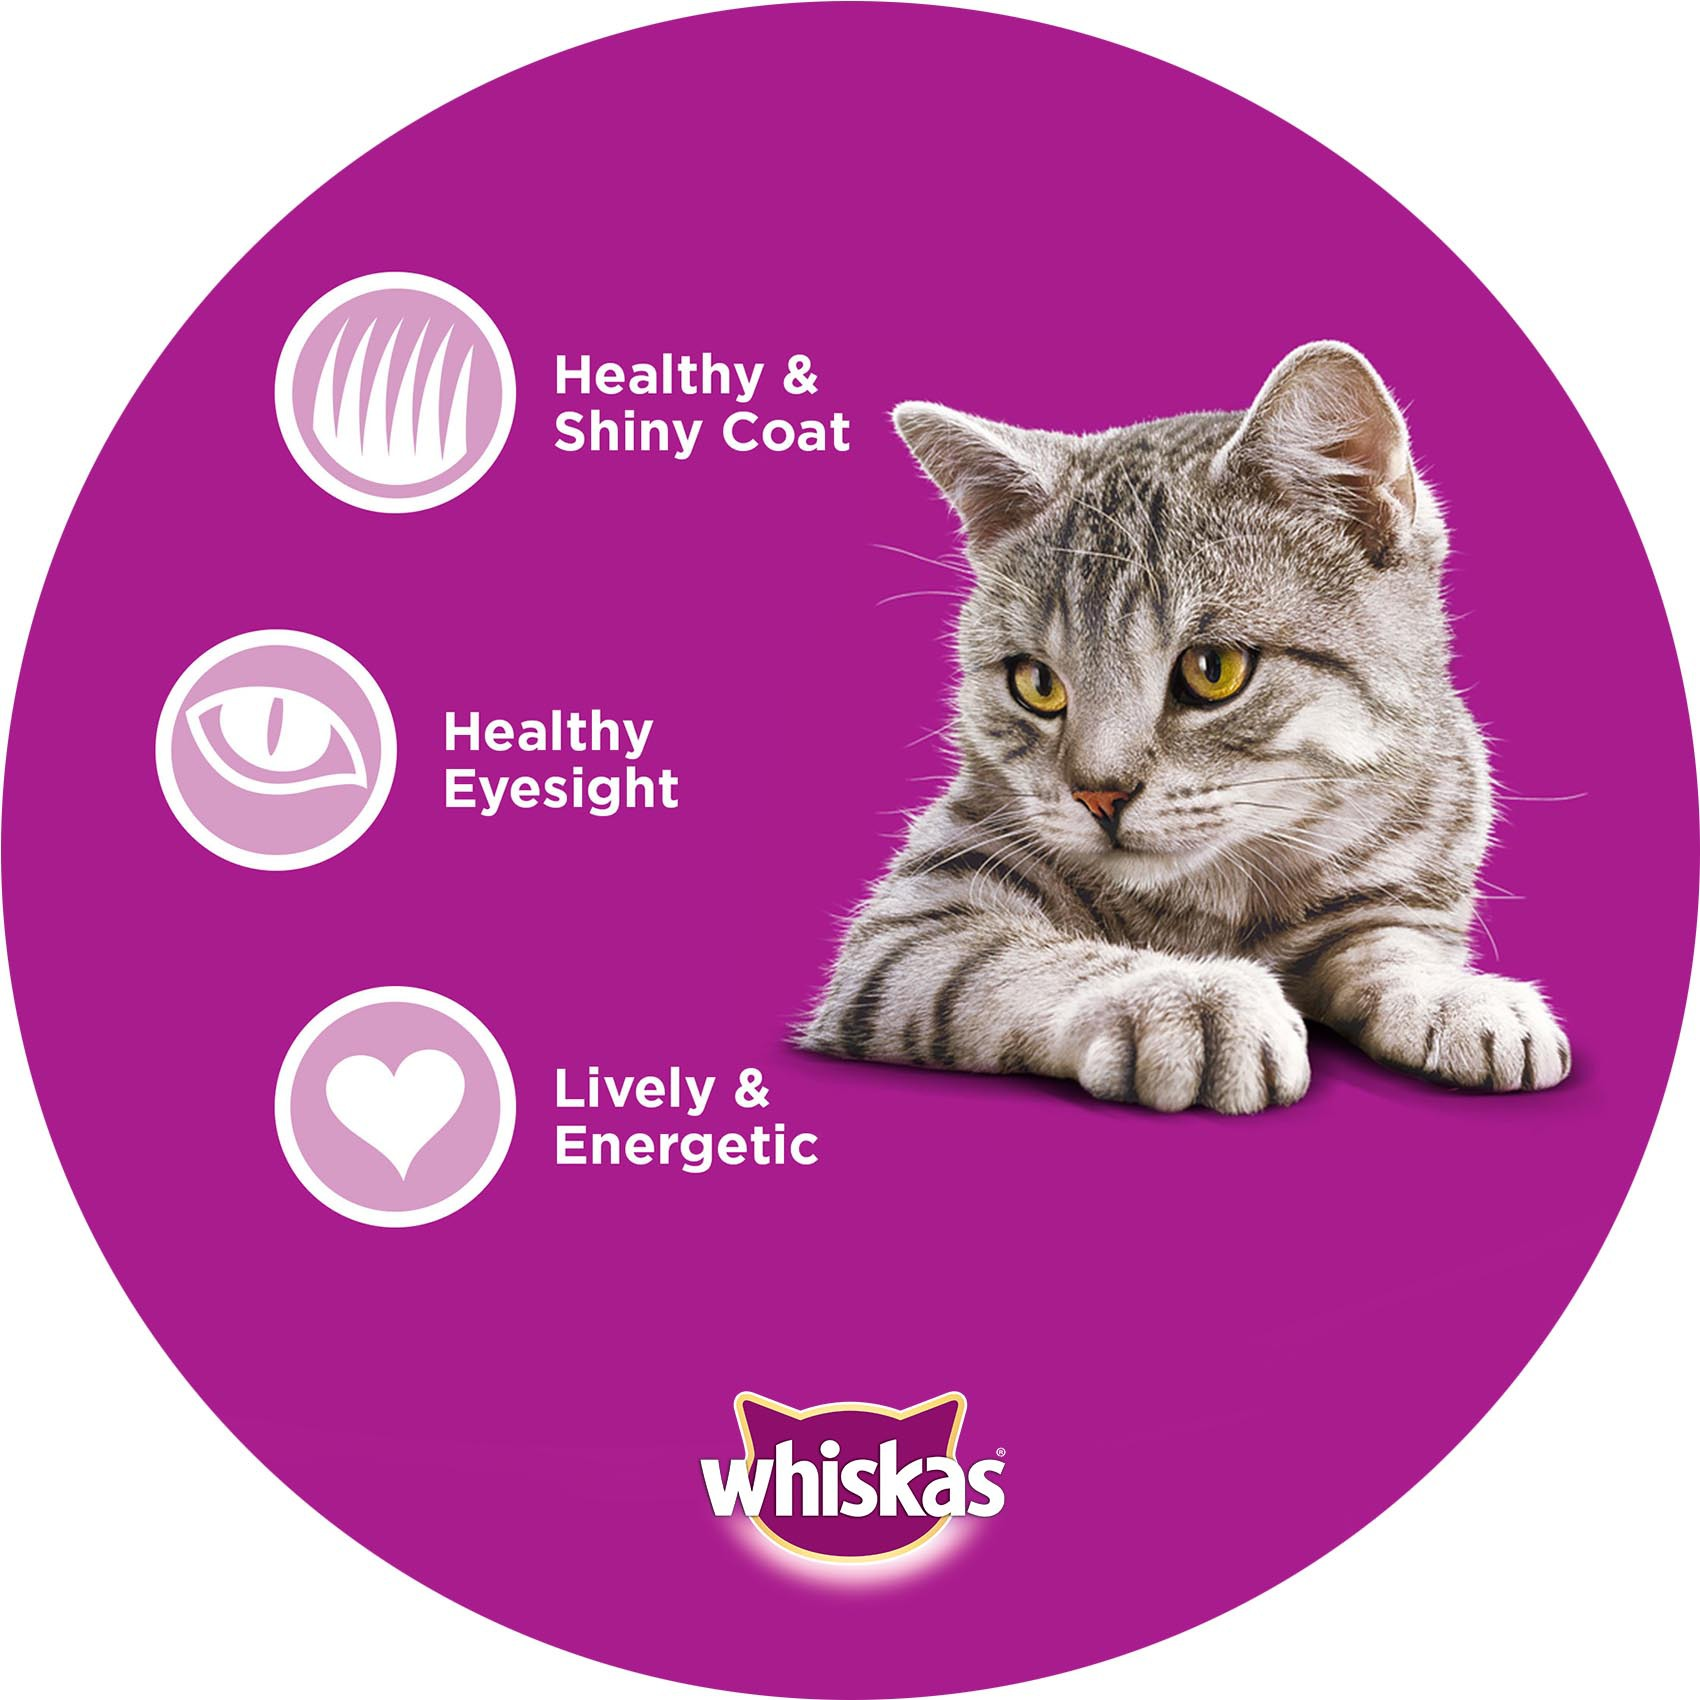 Buy whiskasreg hairball control with chicken amp tuna dry cat whskas chkntuna hair ctrl 11kg gumiabroncs Choice Image